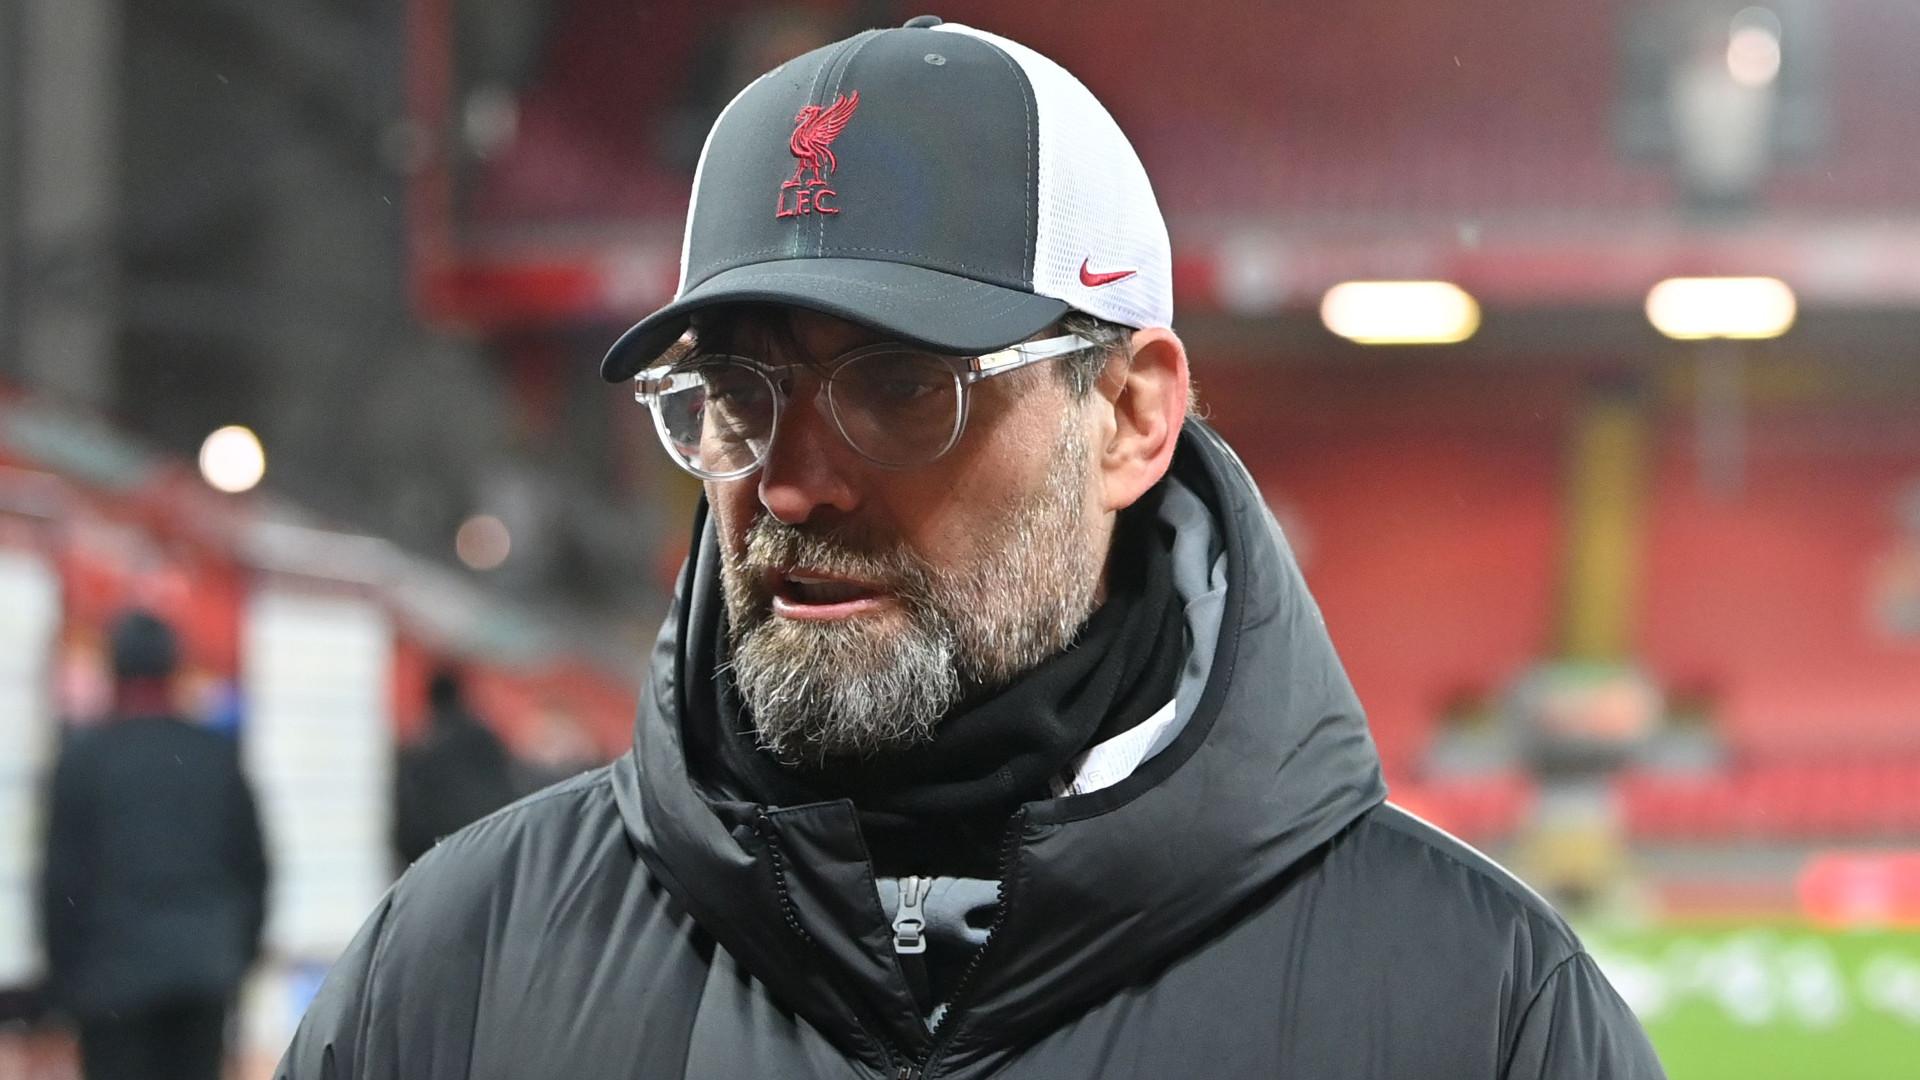 Jurgen Klopp questions Everton penalty as Liverpool slump to dismal derby defeat